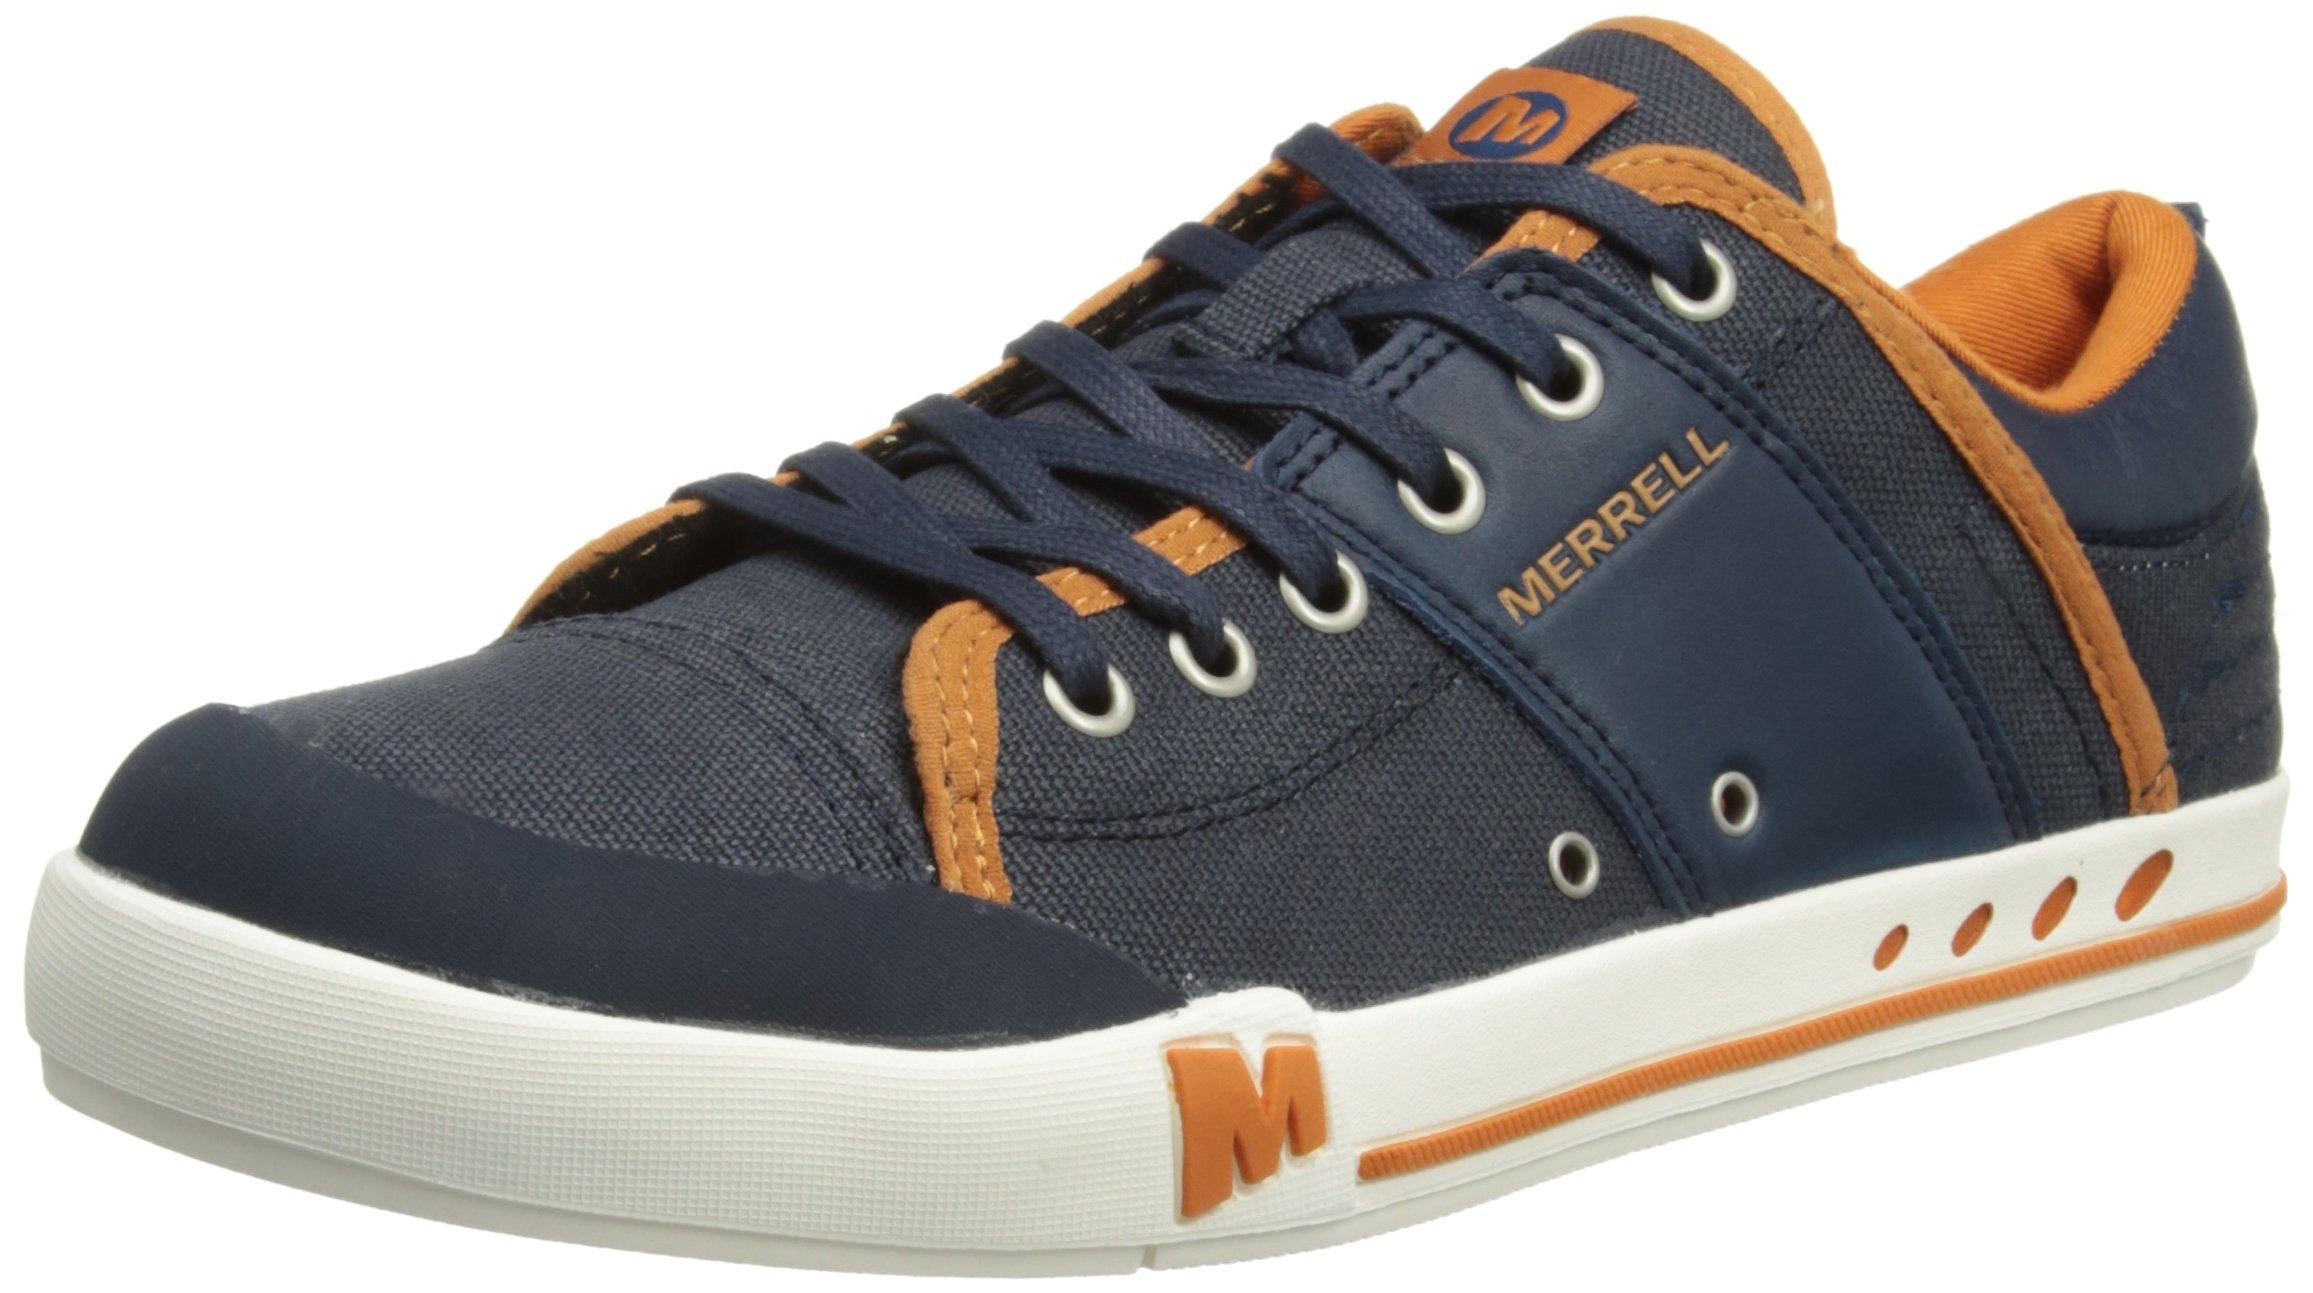 MerrellJ41 Eu533 Sea Eu Chaussure Bering De Tennis Bleubleunavy 5 41 oQdBrCxWe